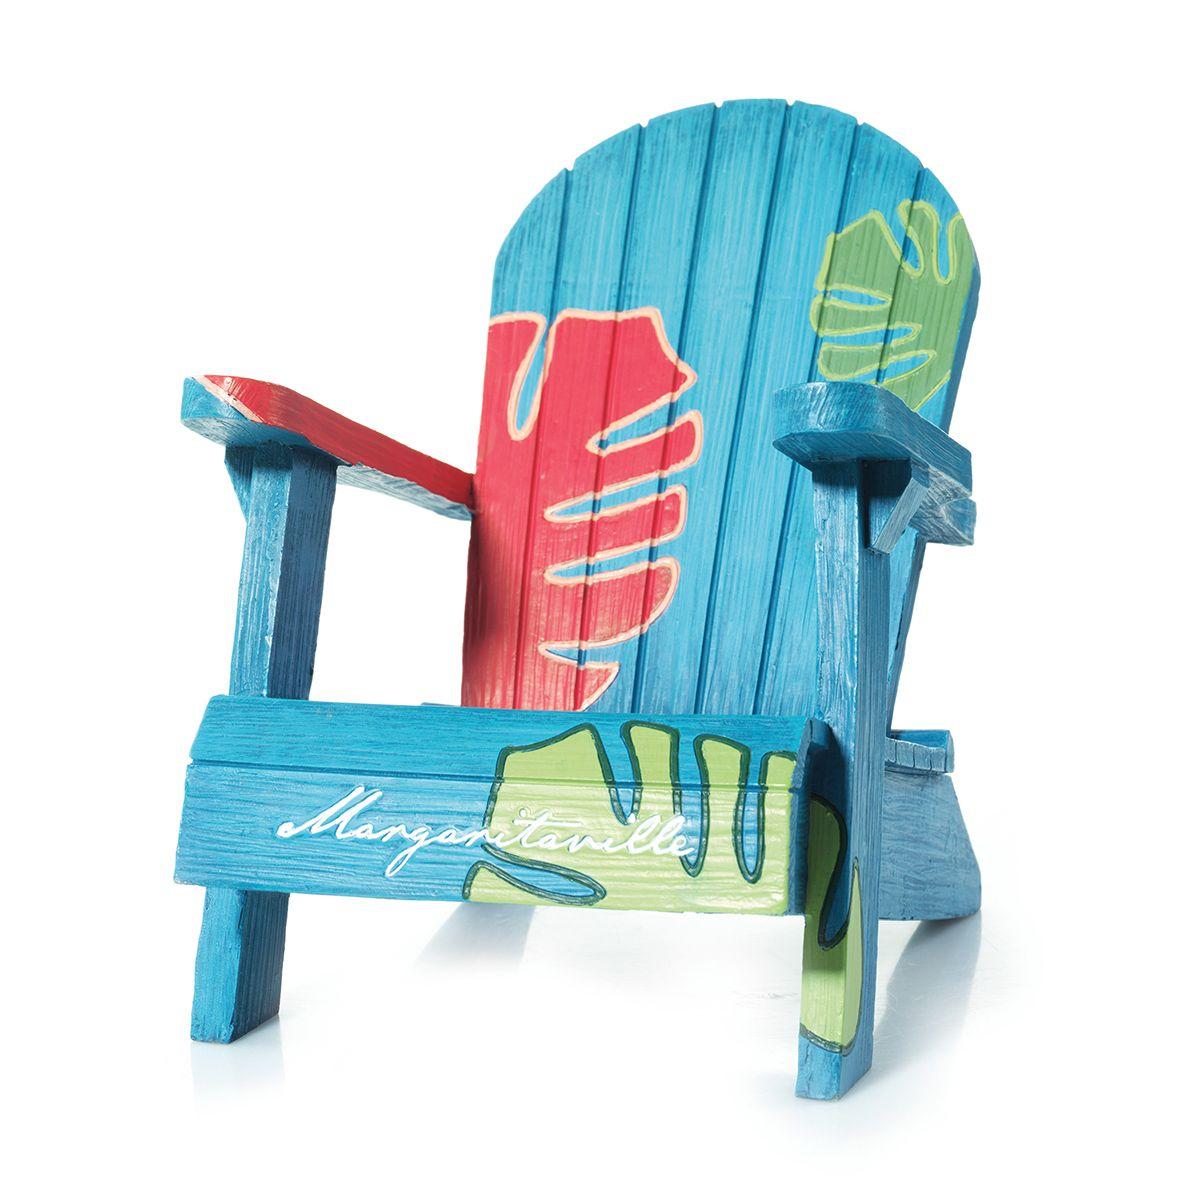 Lawn Chair 40 Oz: Adirondack Jar Candle Holder In 2019